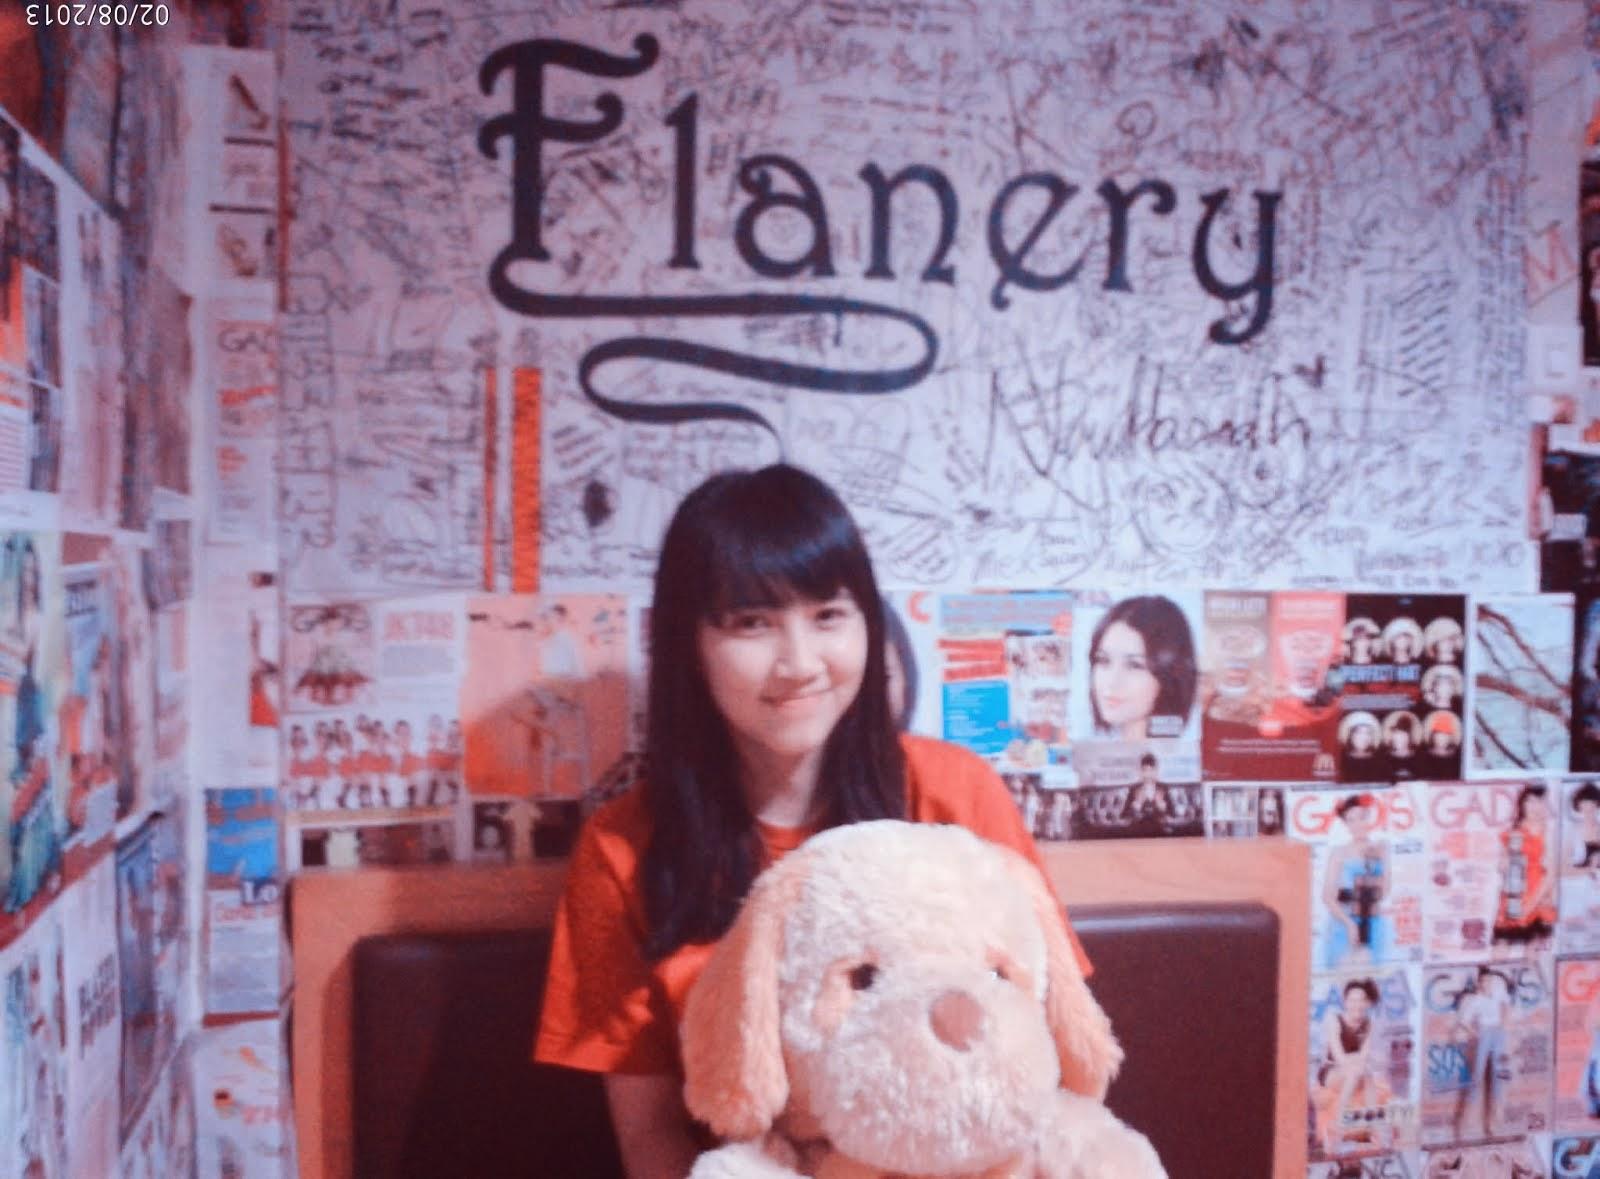 Flanery Witoko